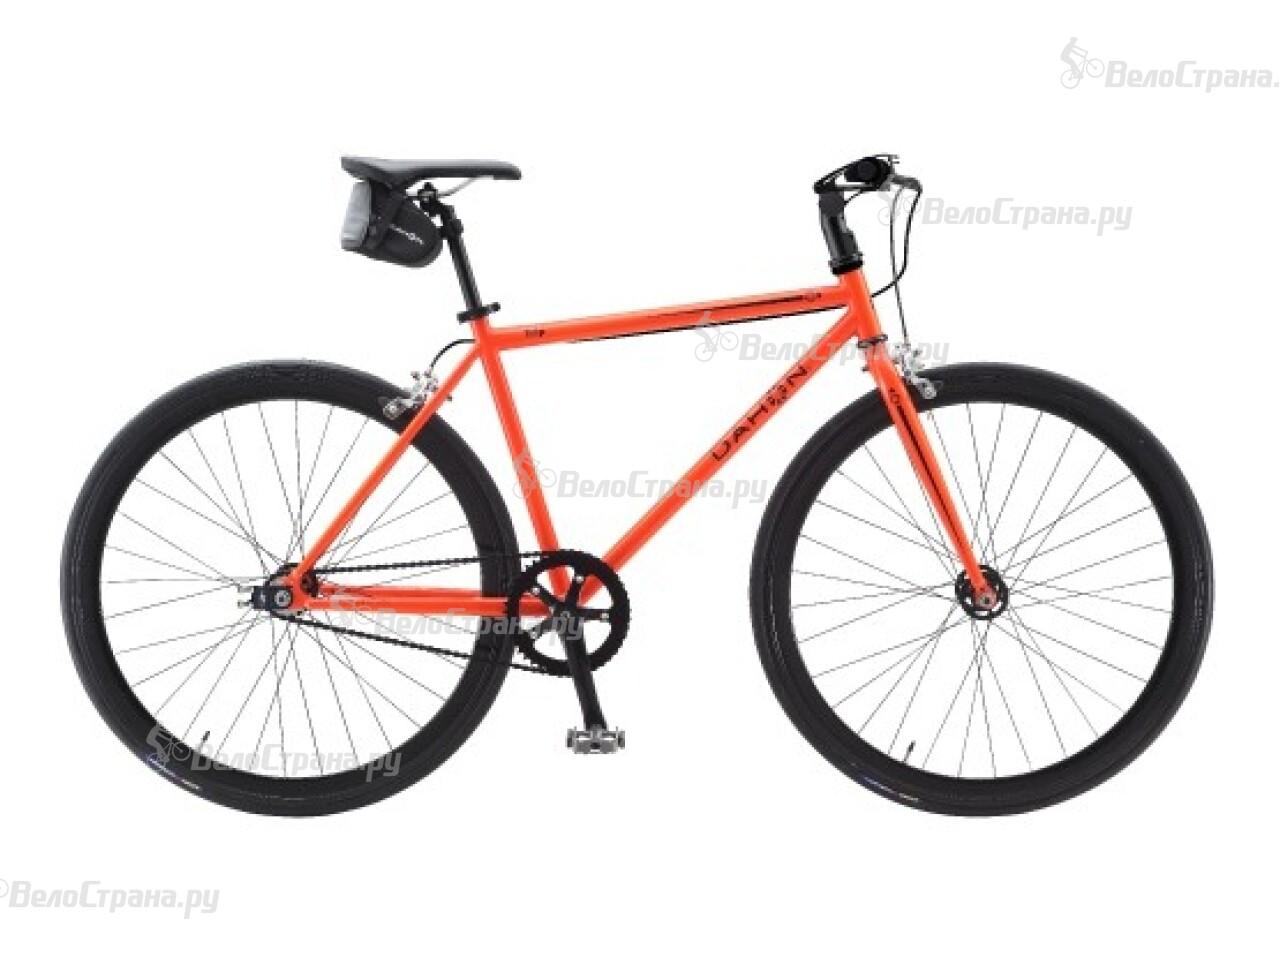 Велосипед Dahon Trip Uno (2015) велосипед dahon vybe d7 u 2017